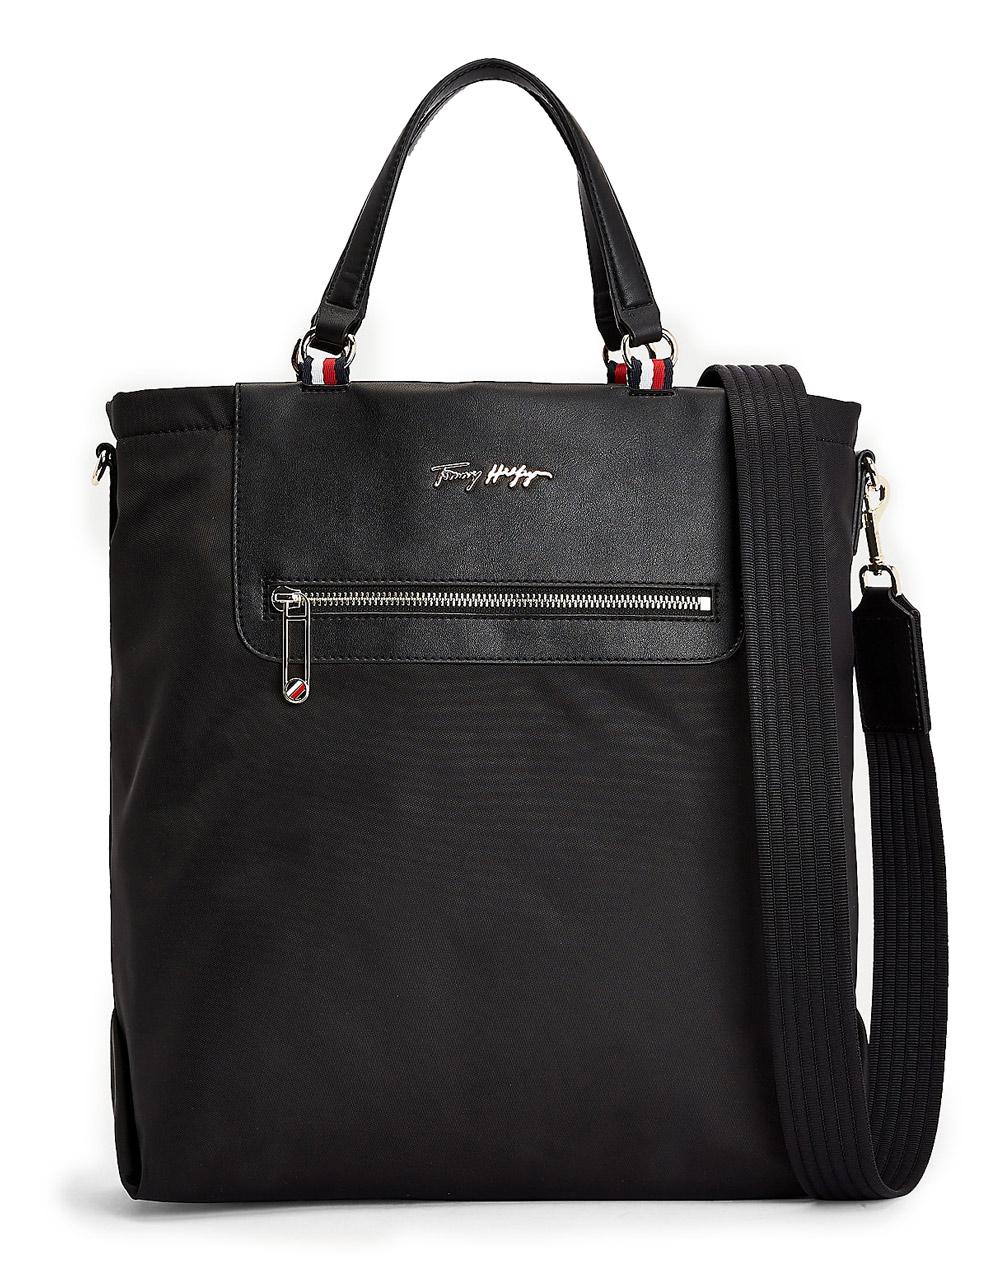 Tommy Hilfiger negre mare geanta